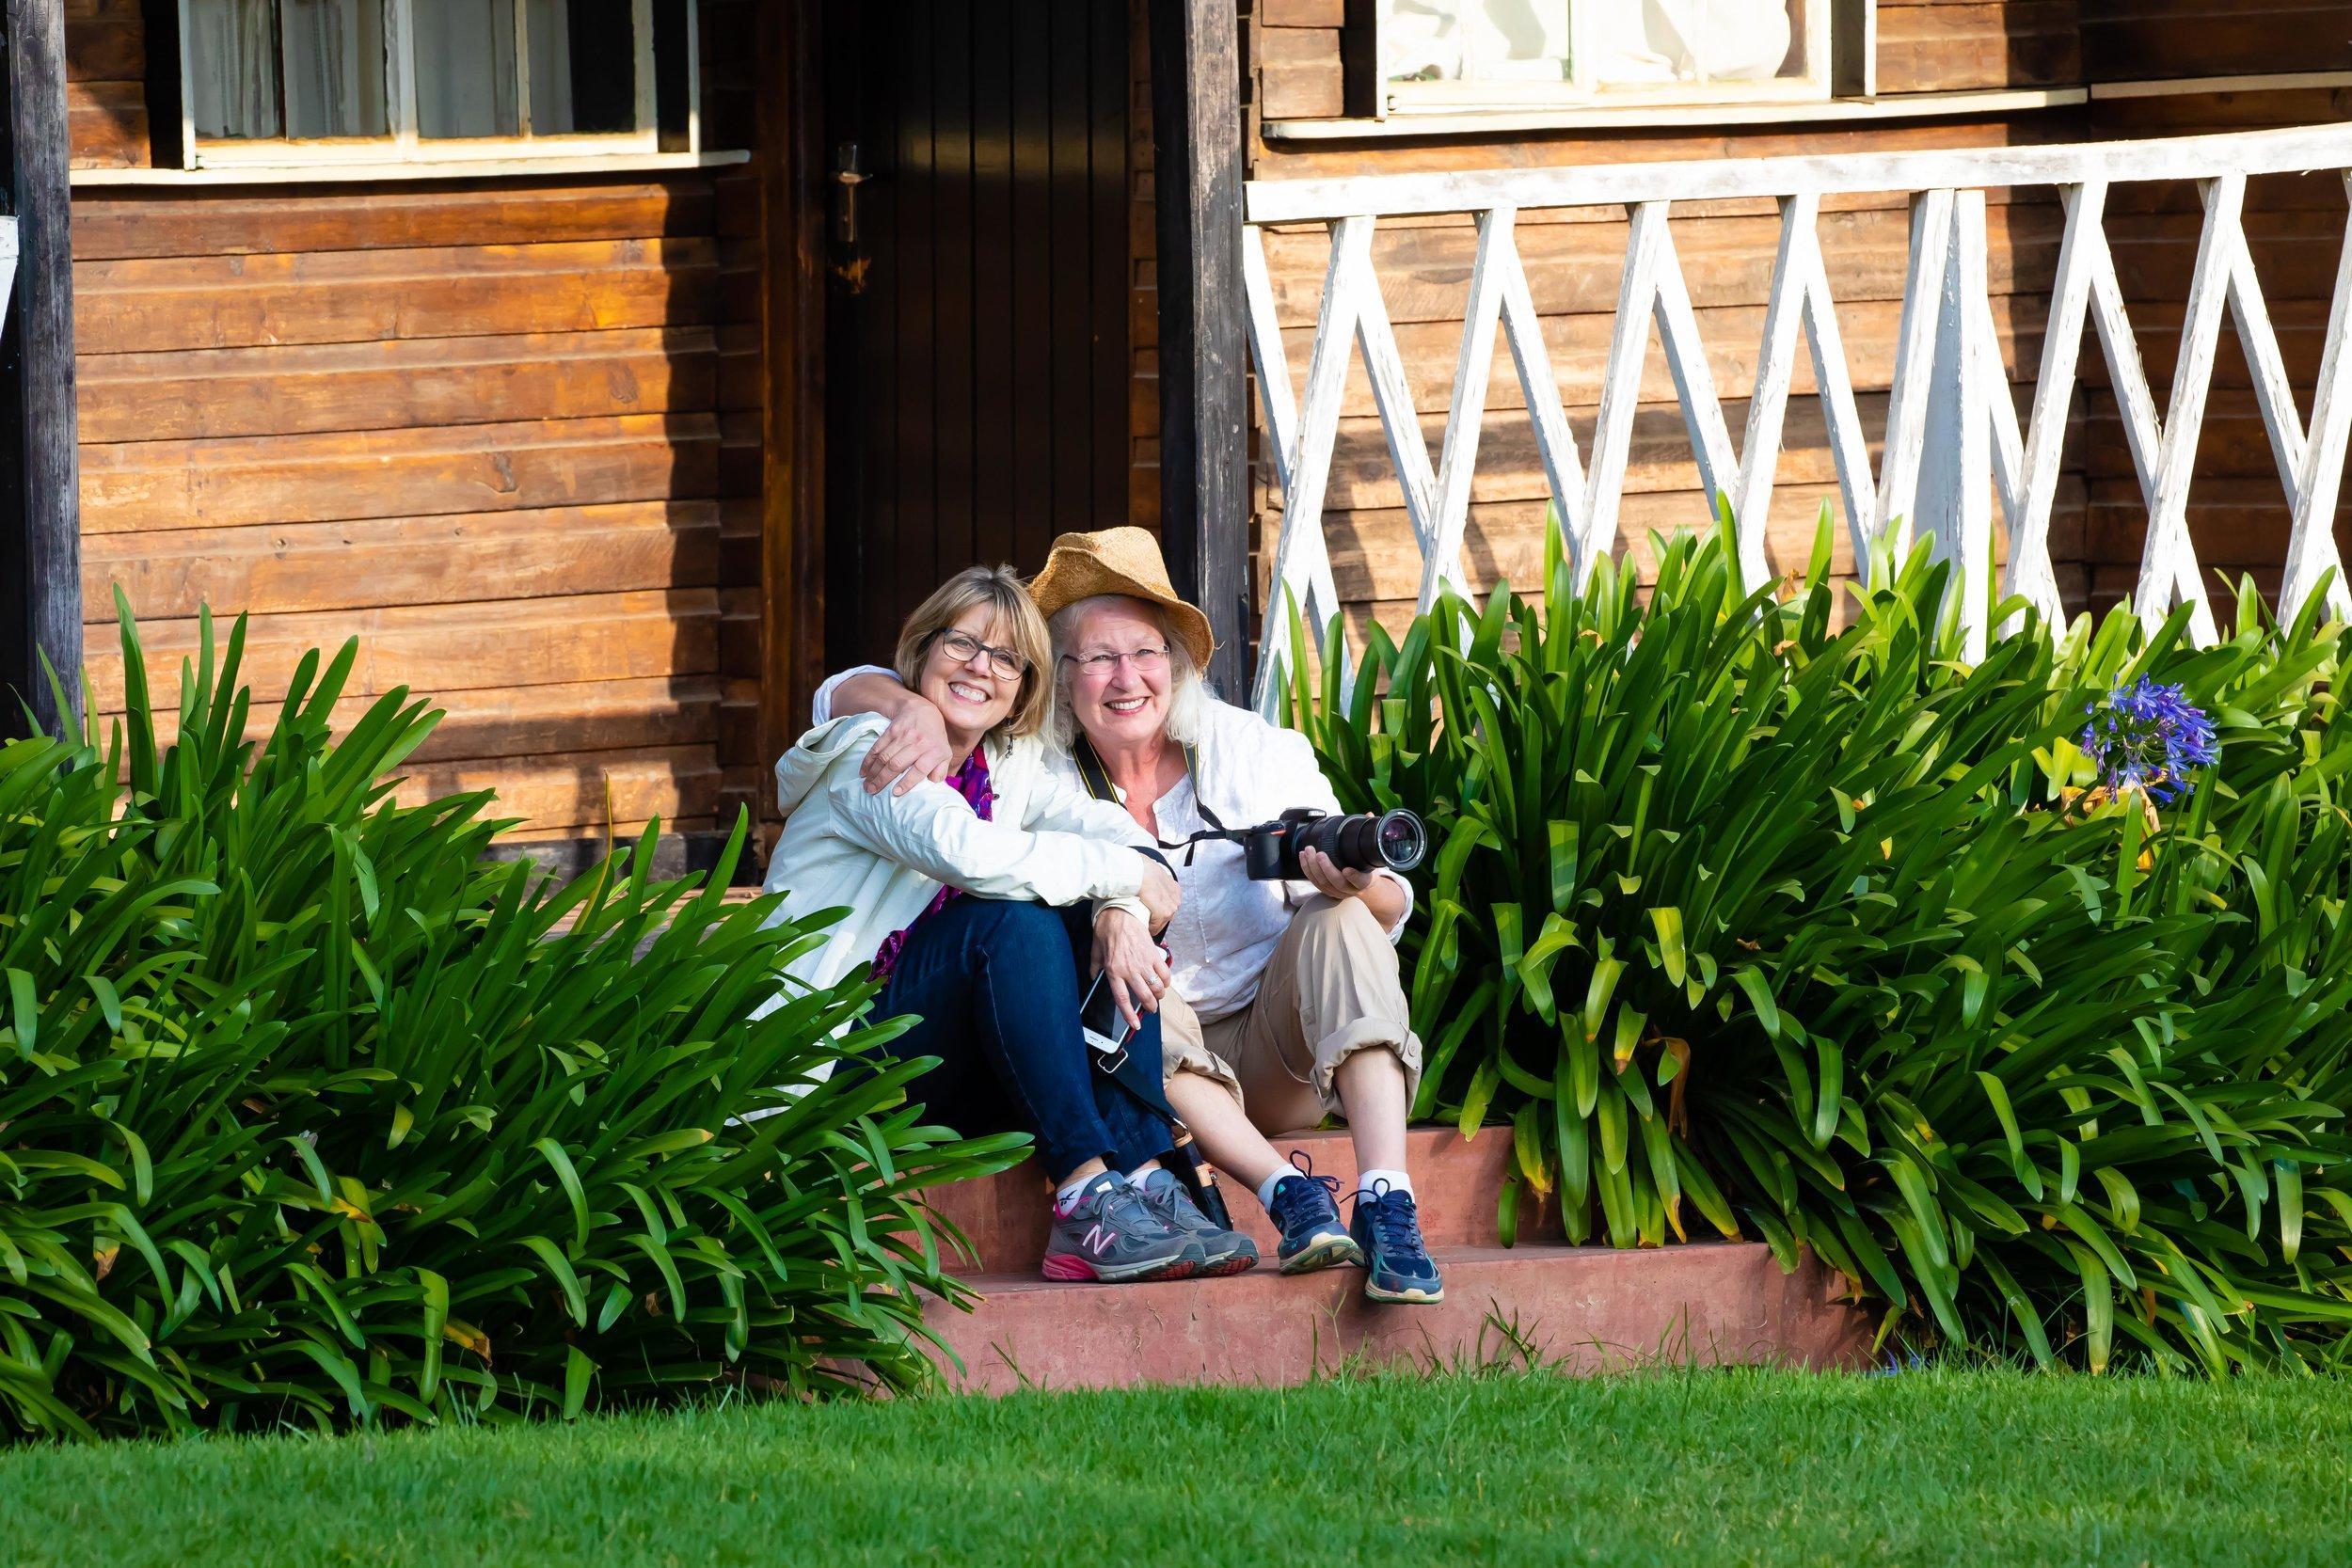 Cheryl and Sharla, The Sportsman's Arms Hotel, Nanyuki, Kenya